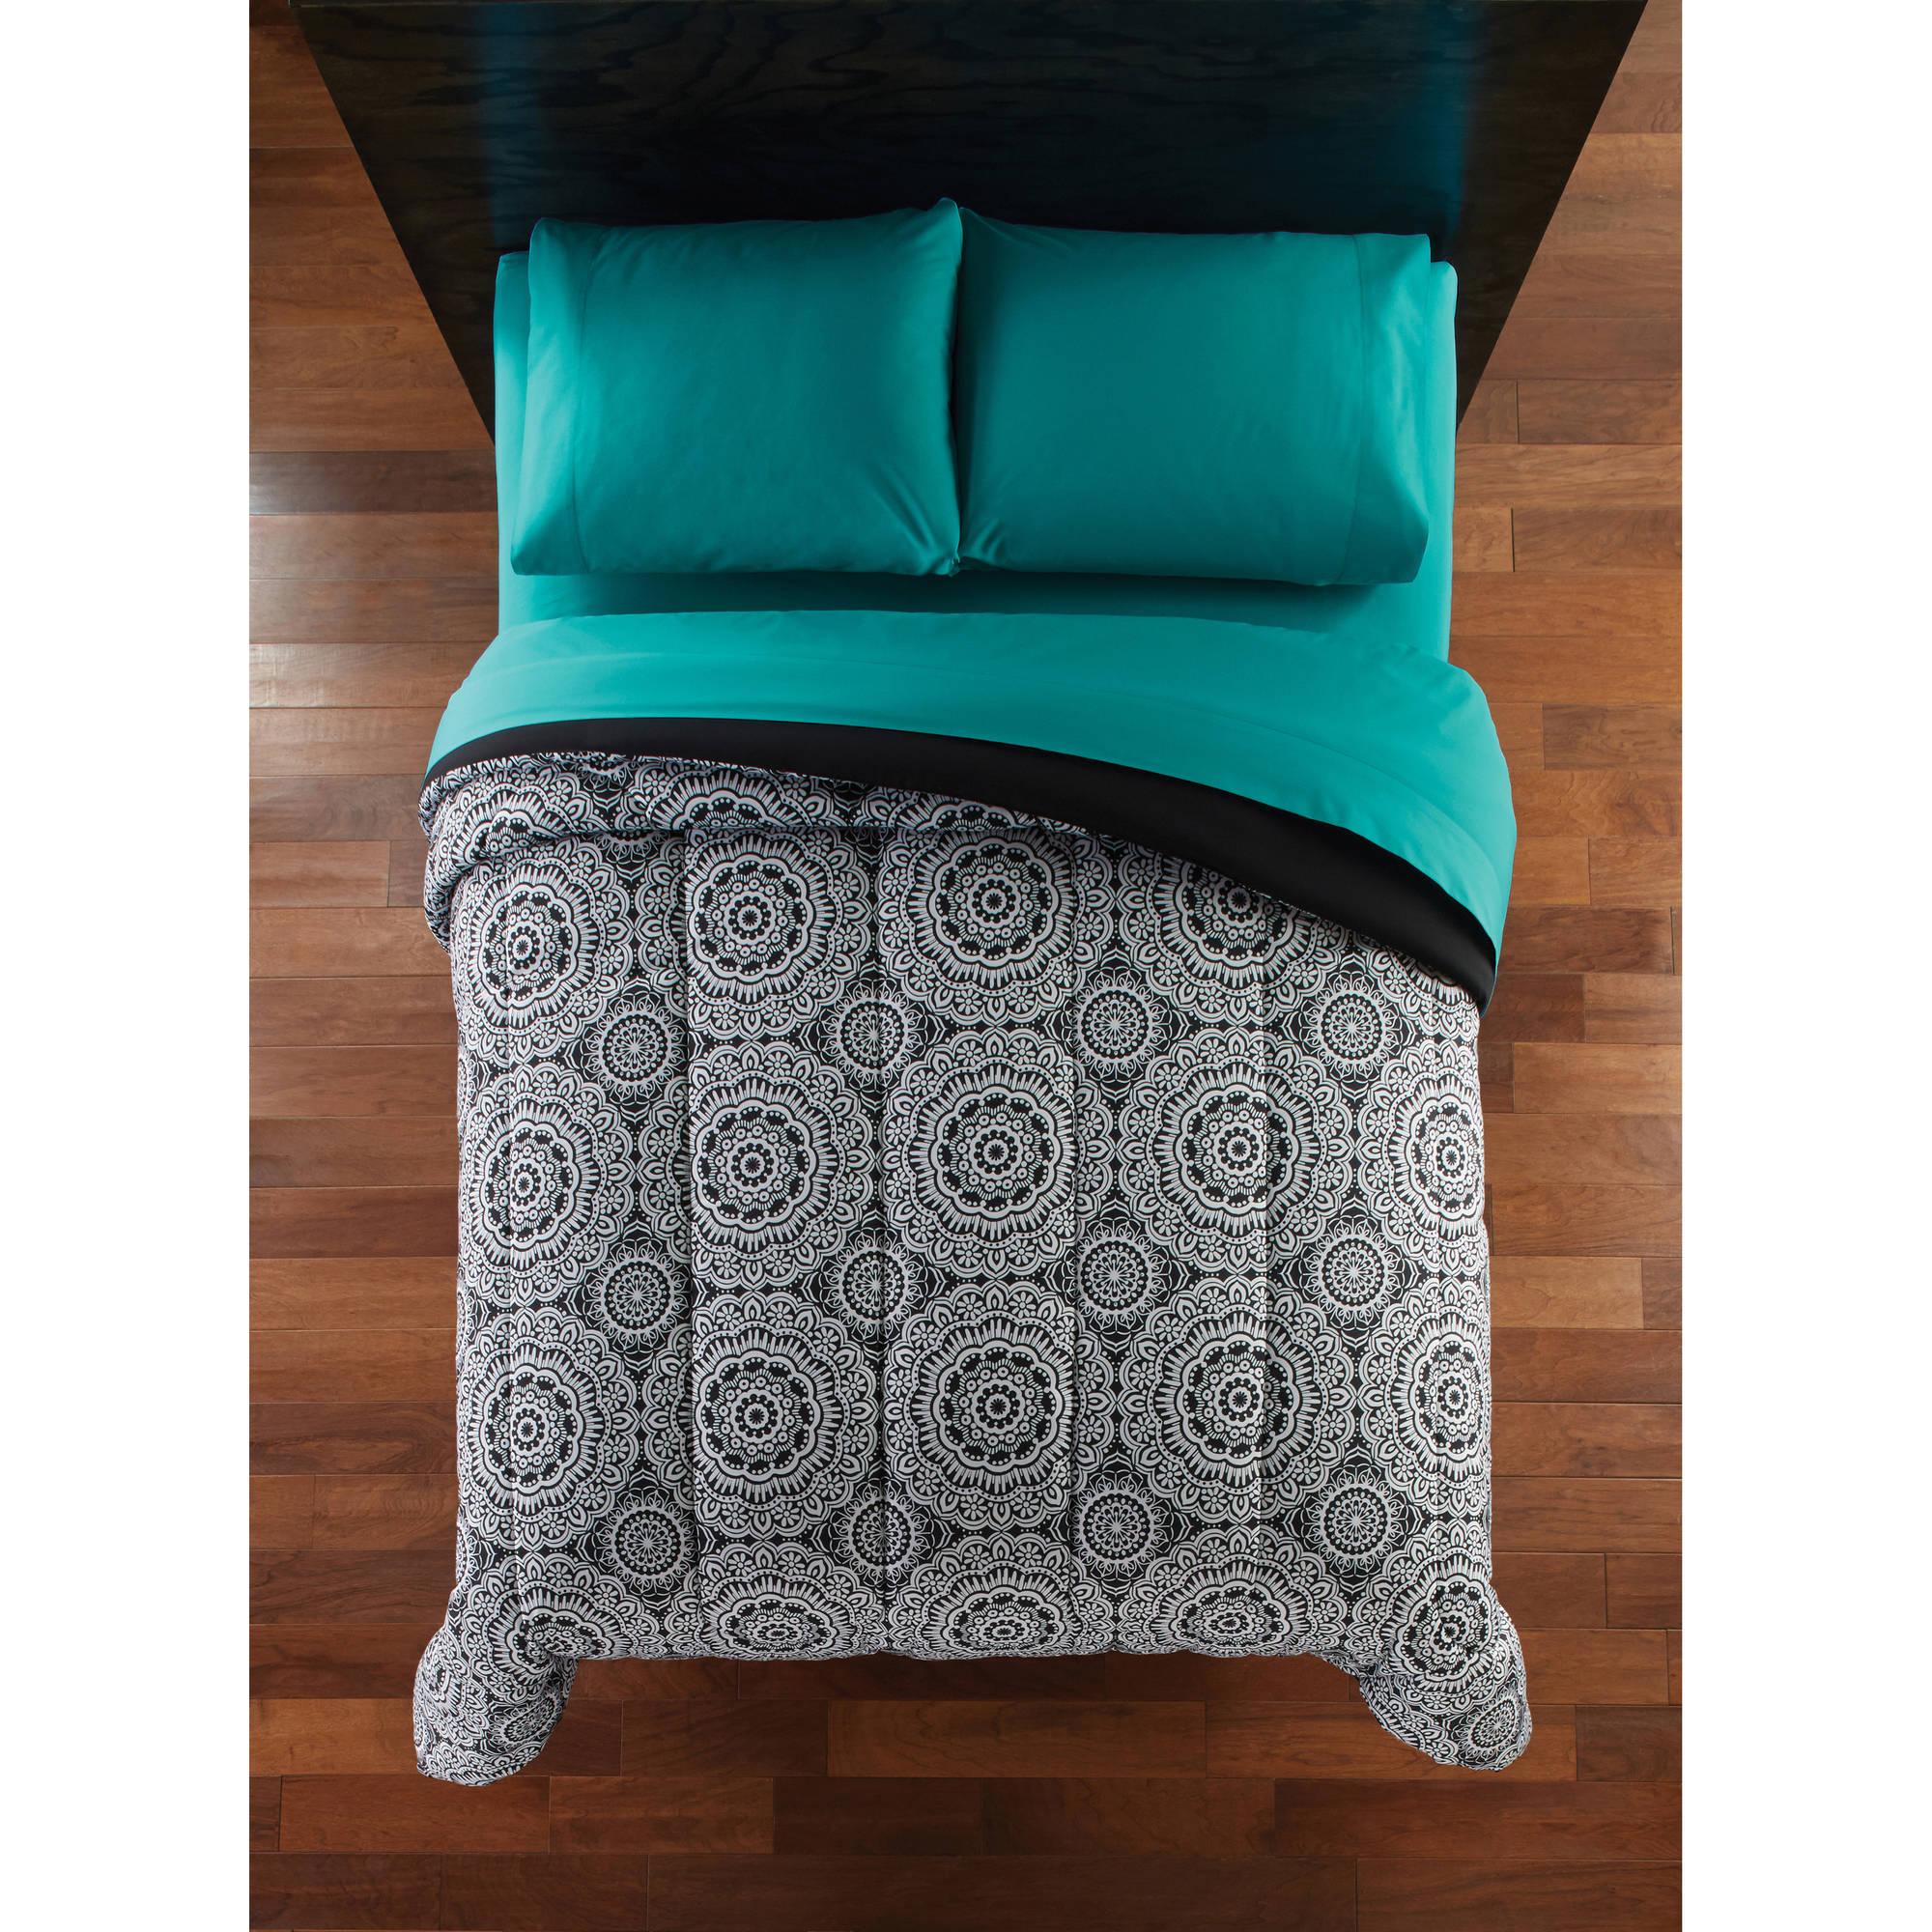 Mainstays Black Medallion Microfiber Bedding Comforter